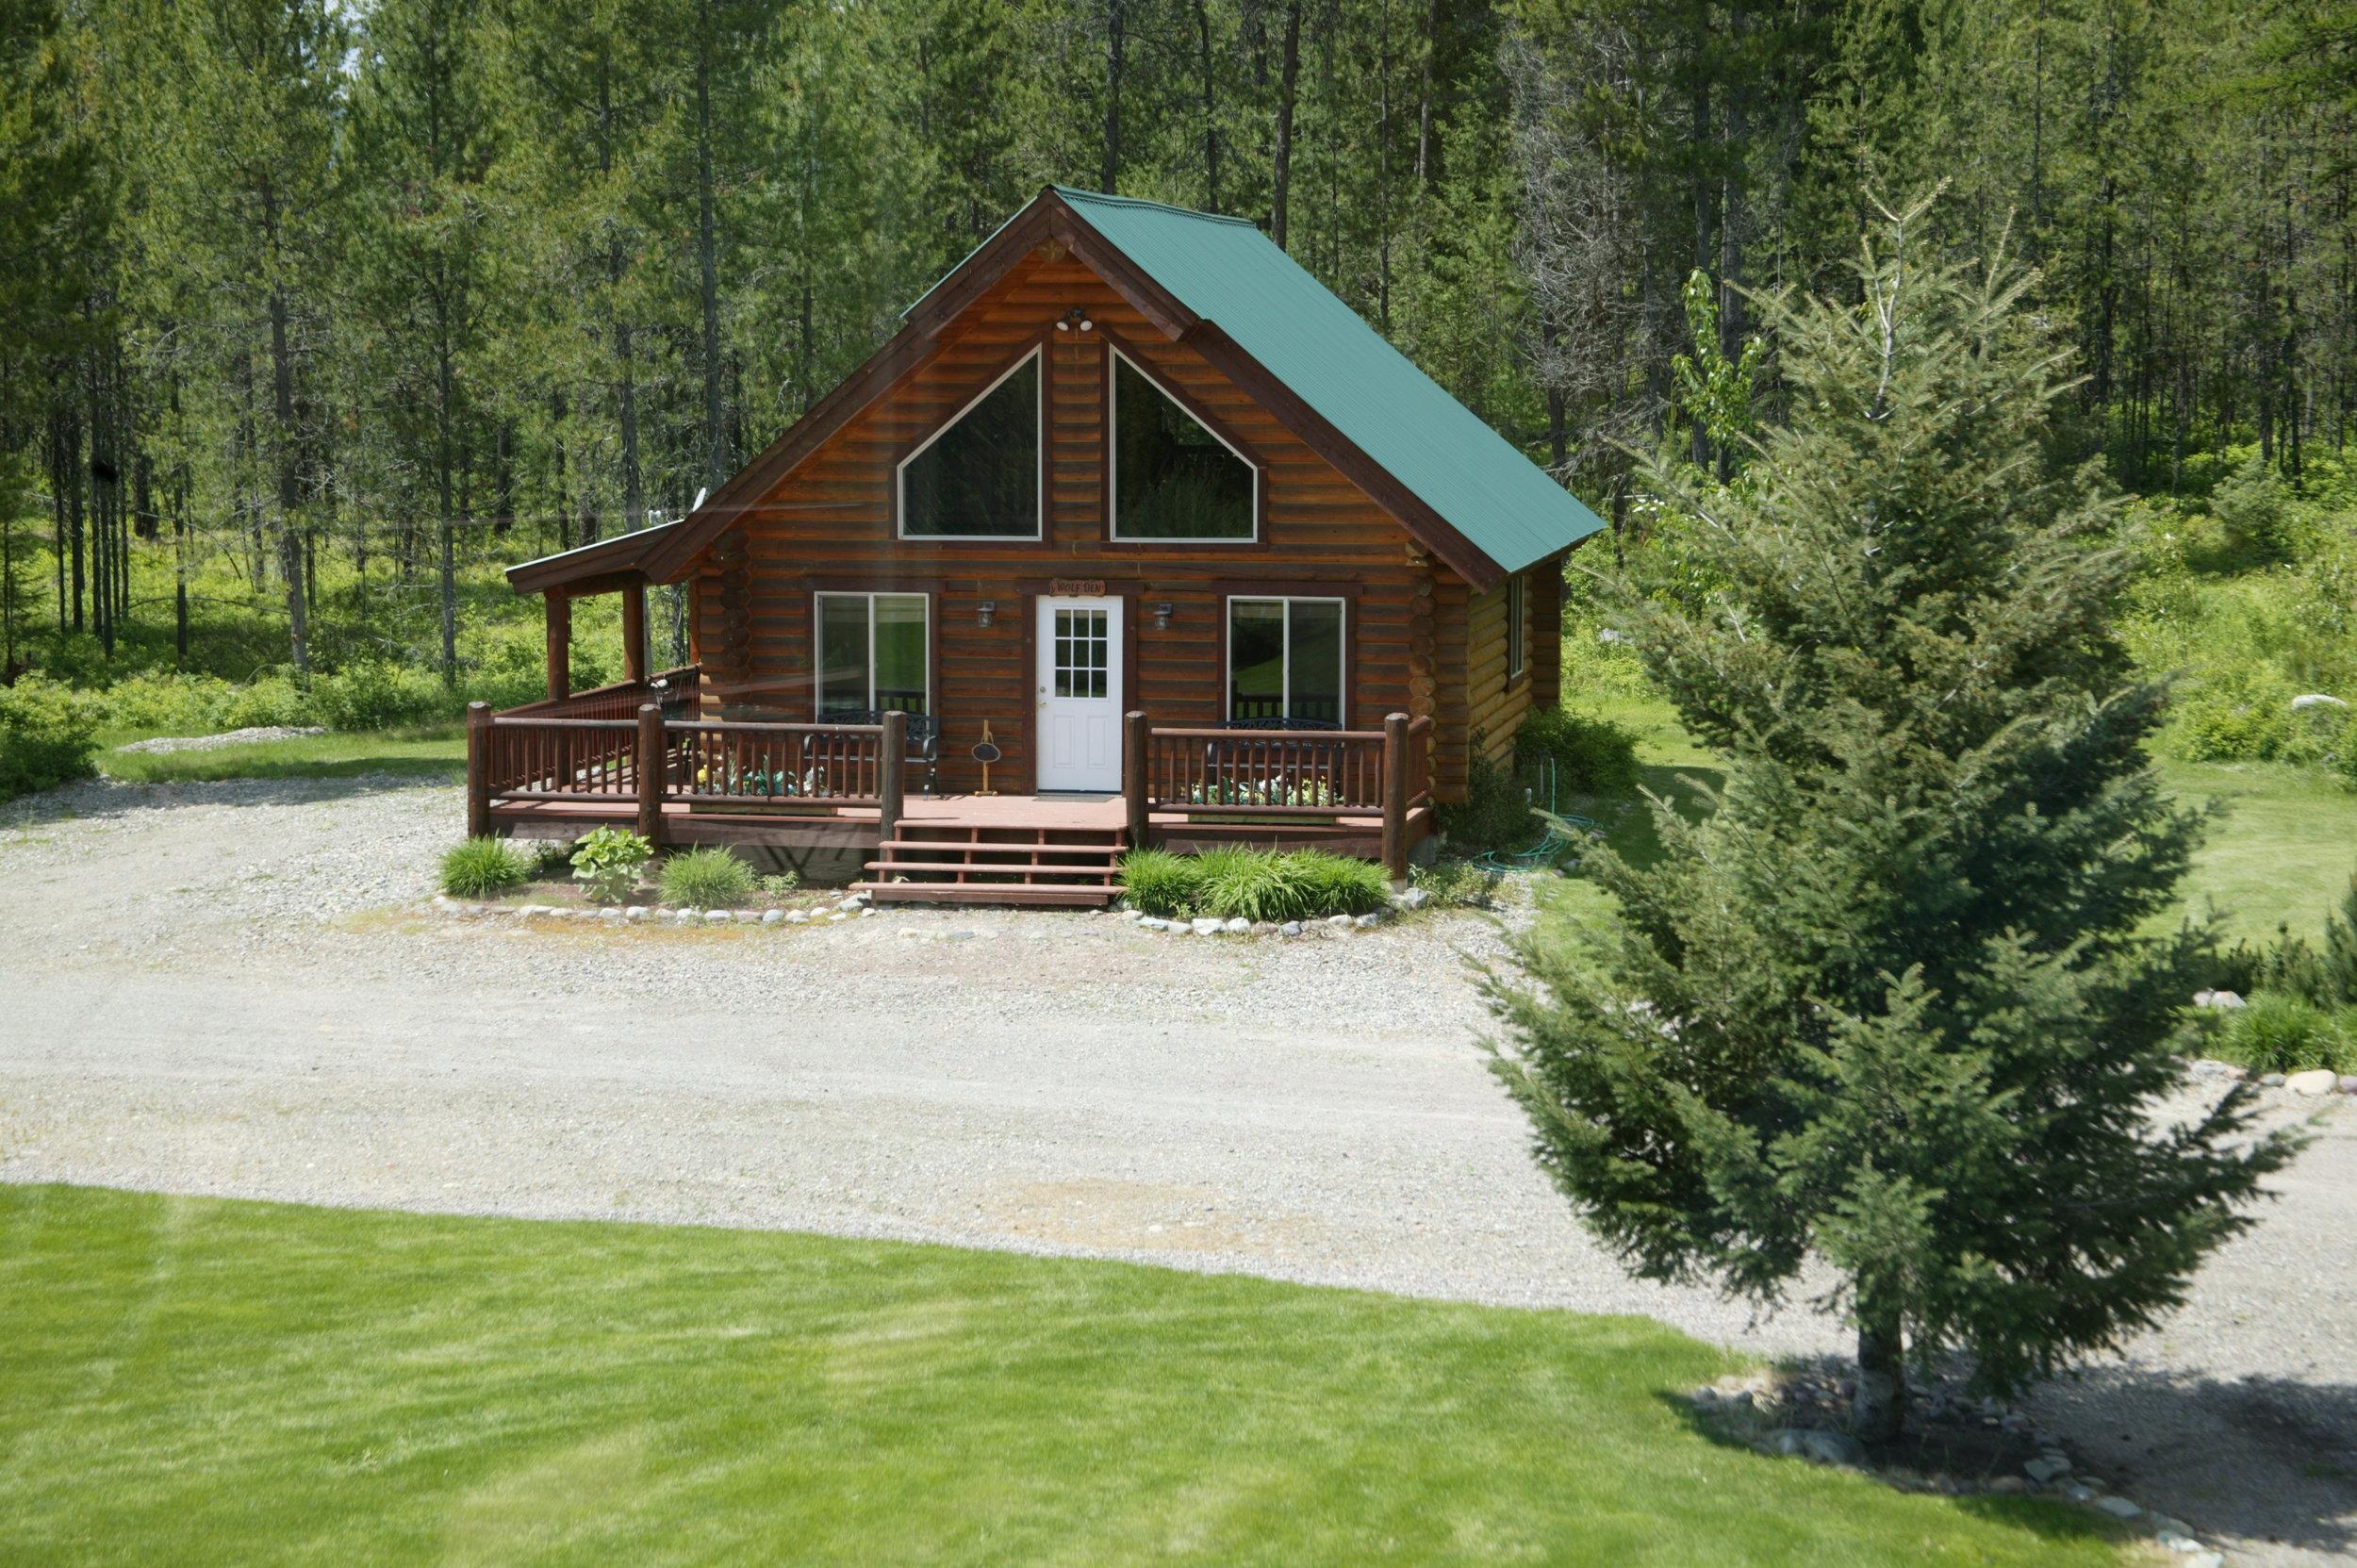 The Wolf Den Cabin